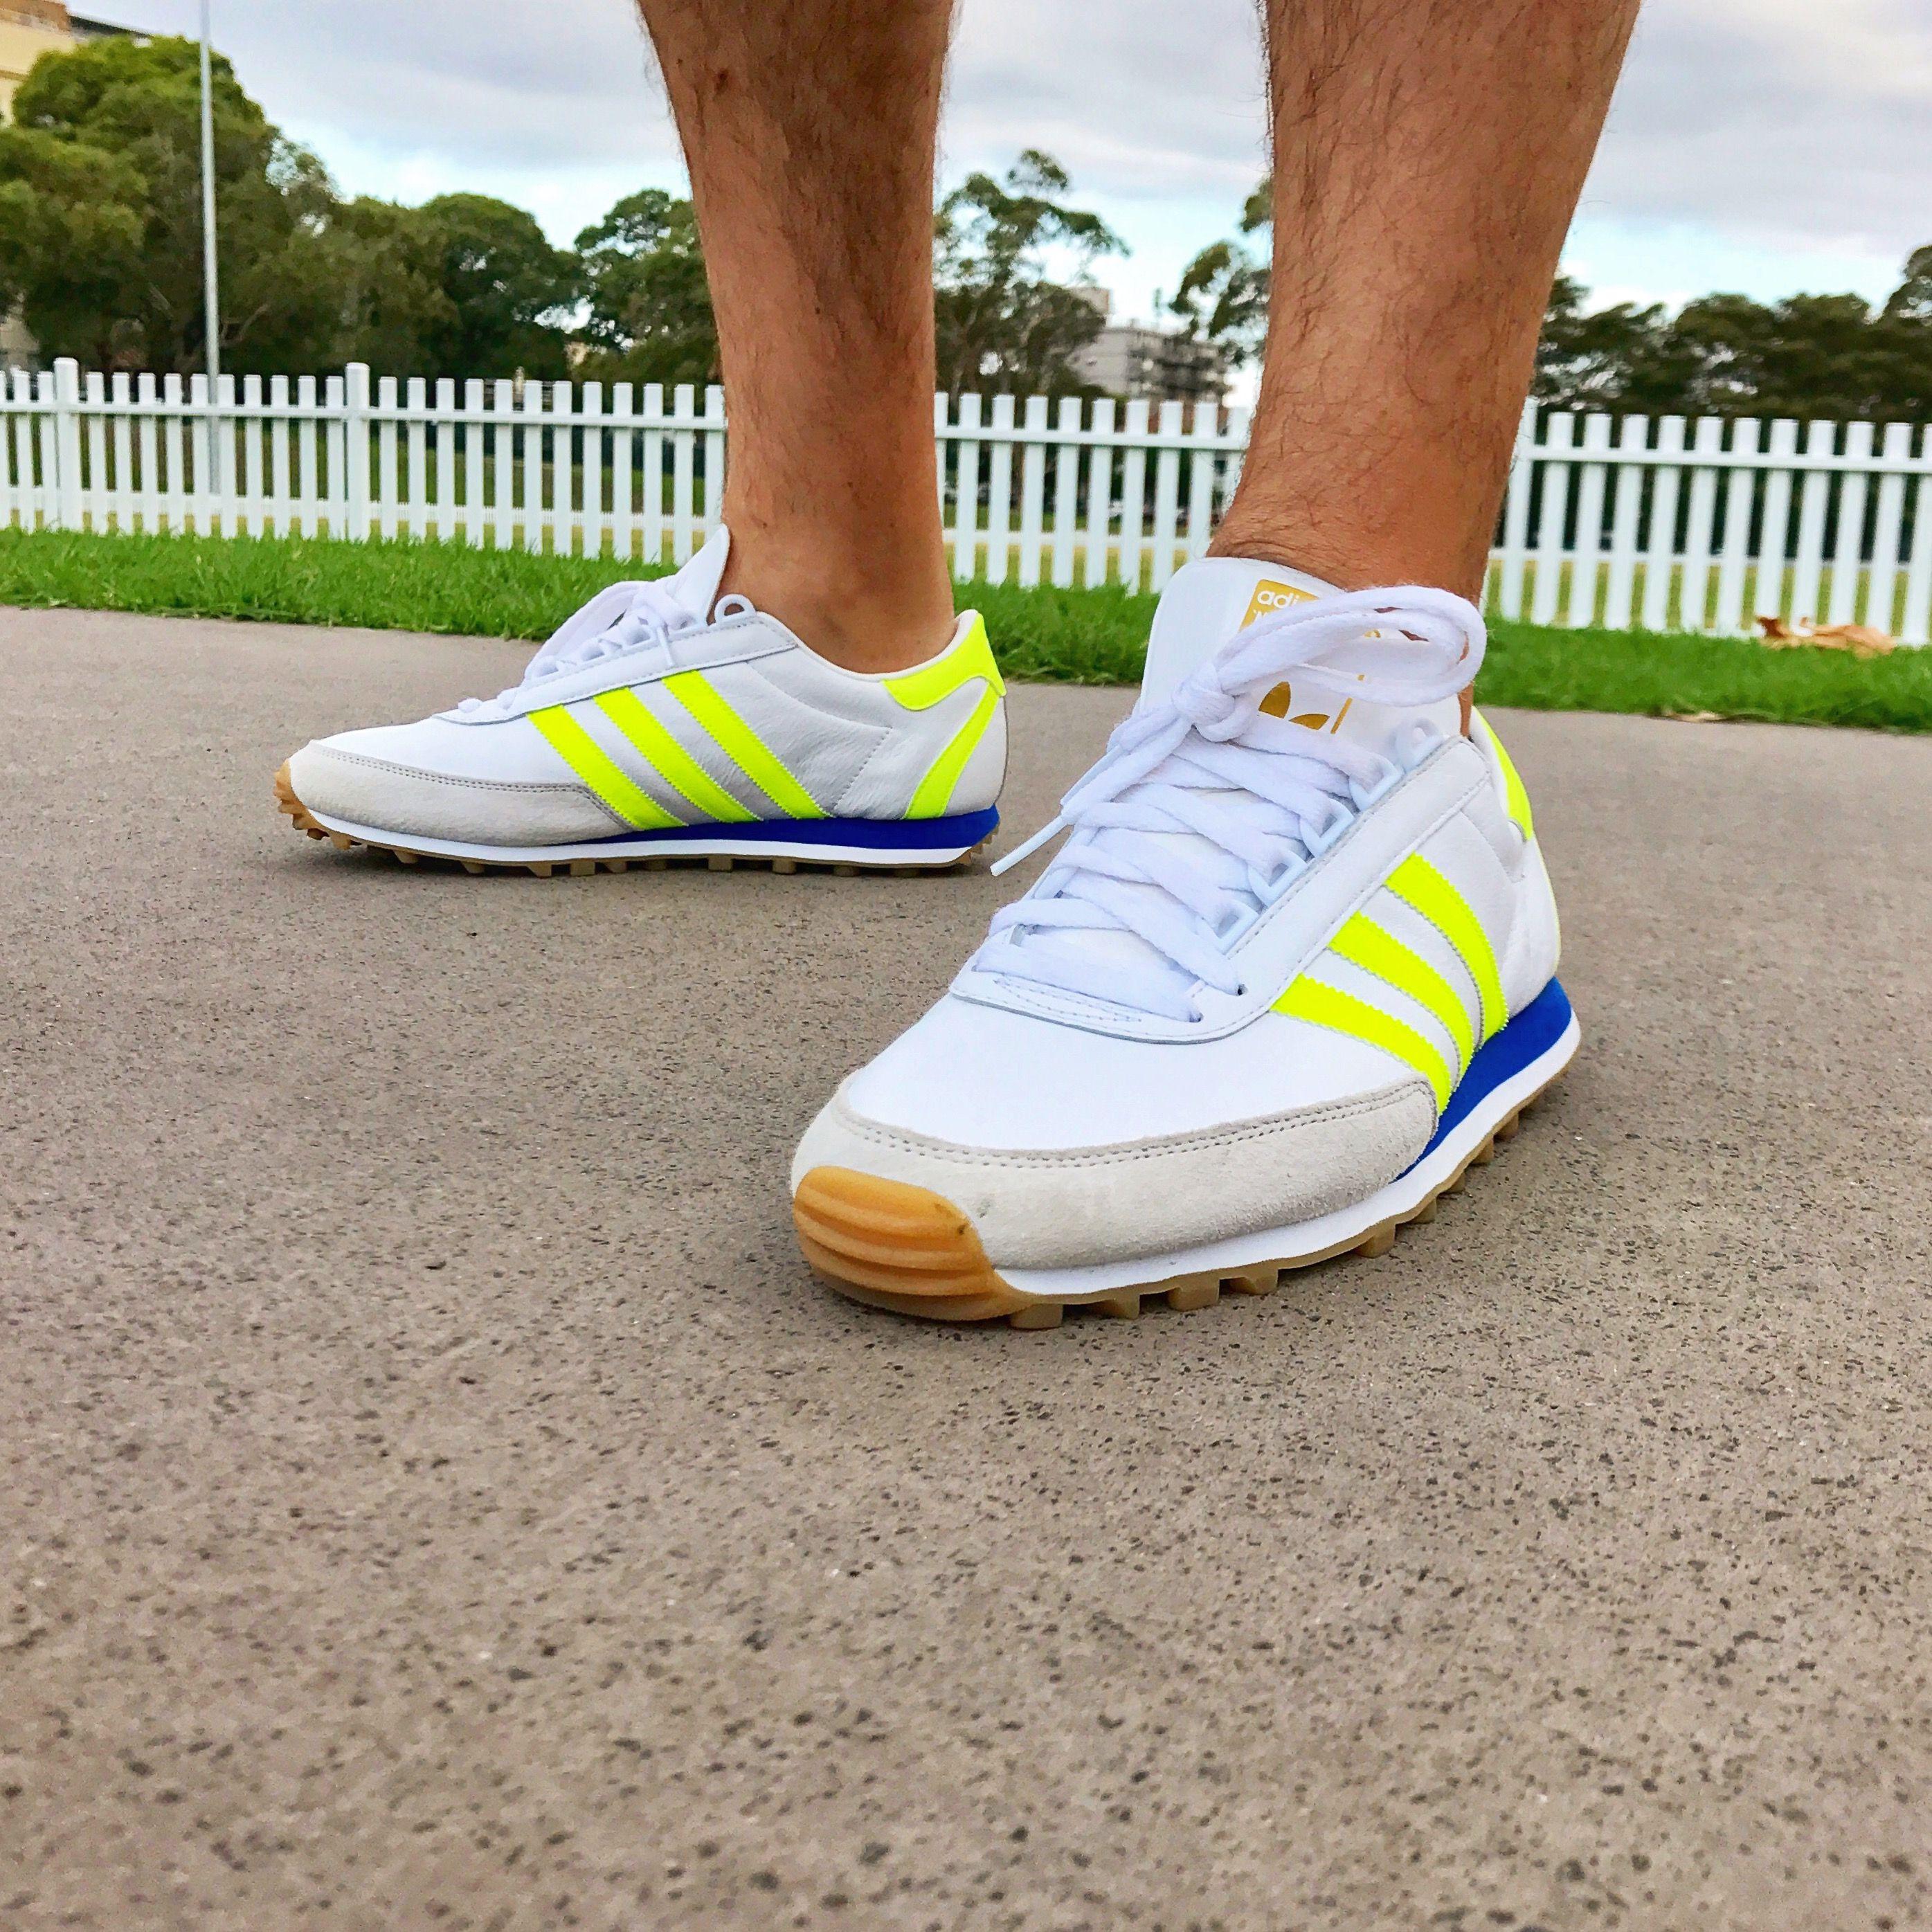 Adidas Originals Nite Jogger Hot Shoes Sneakers Adidas Sneakers